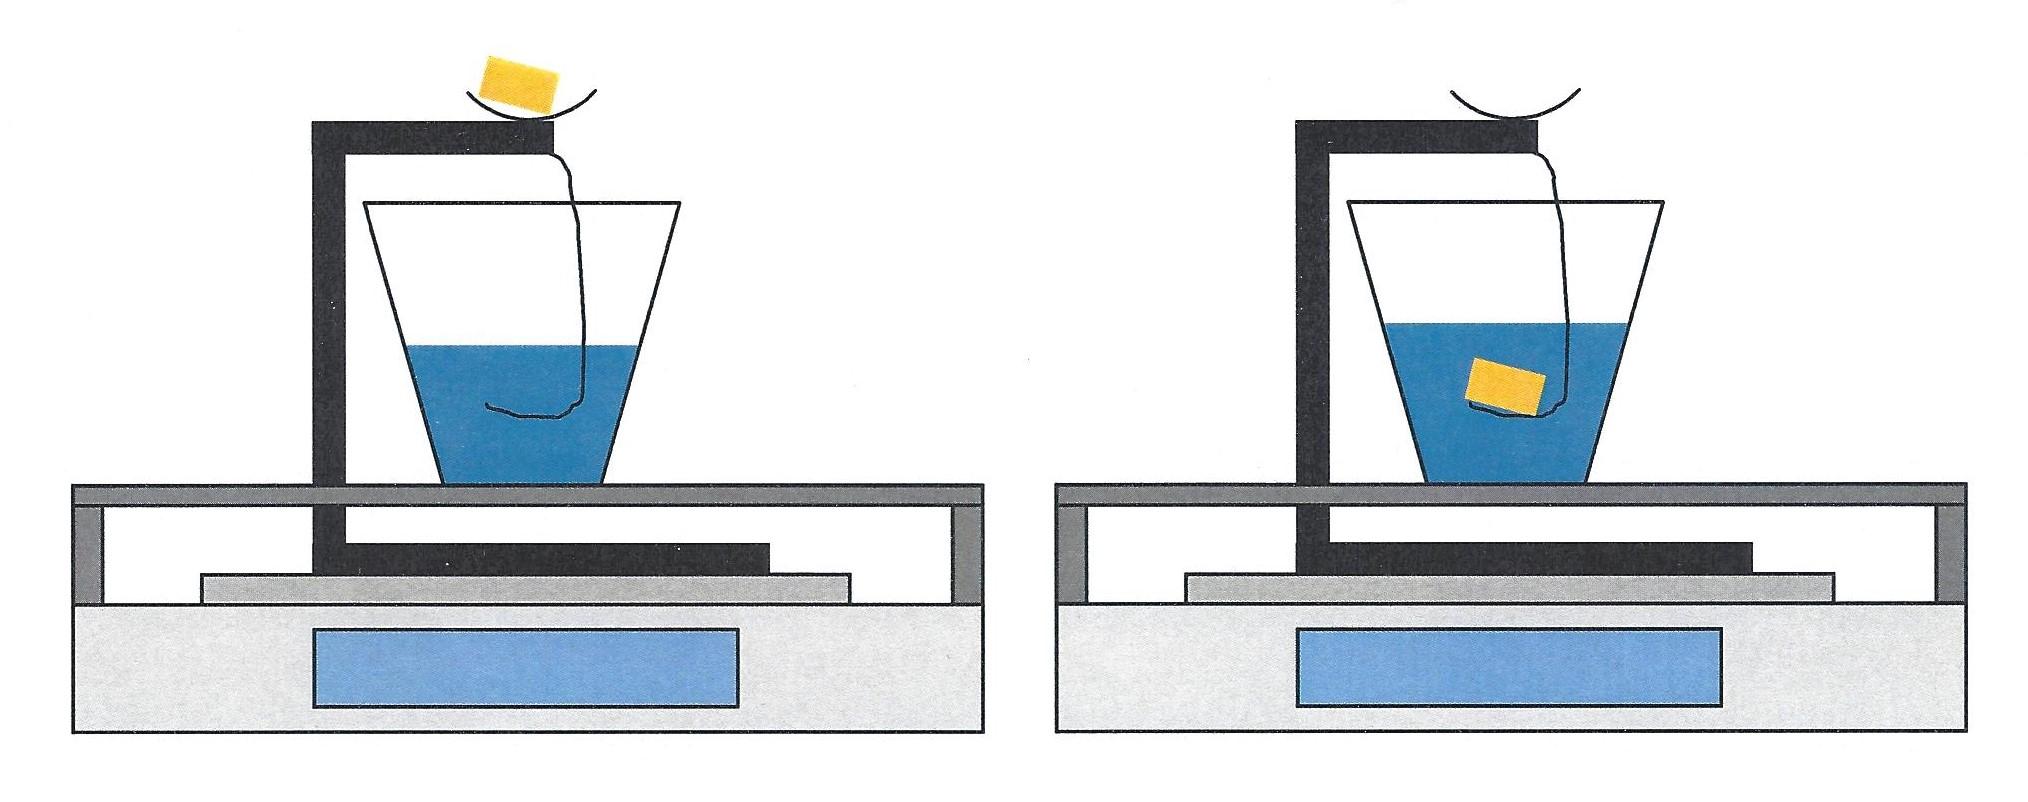 elastomer sample density calculation